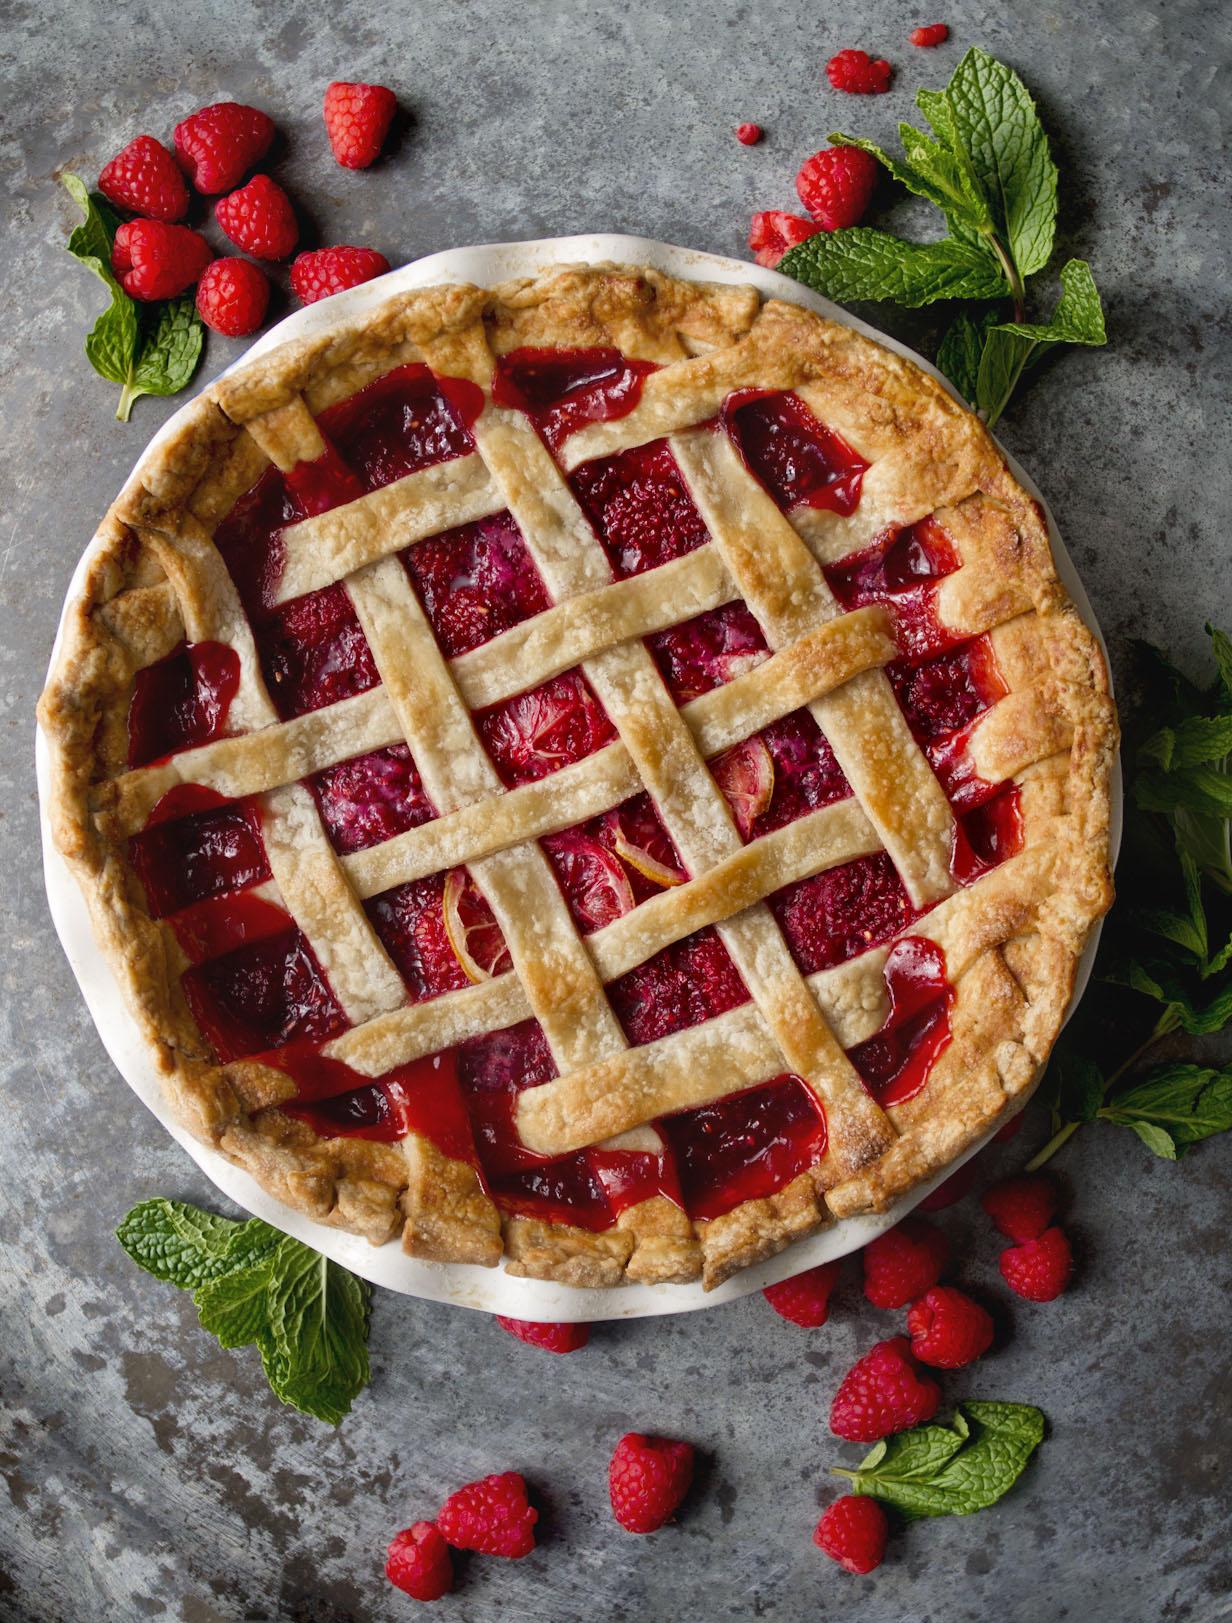 red-raspberry-mint-lattice-pie-food-photography.jpg